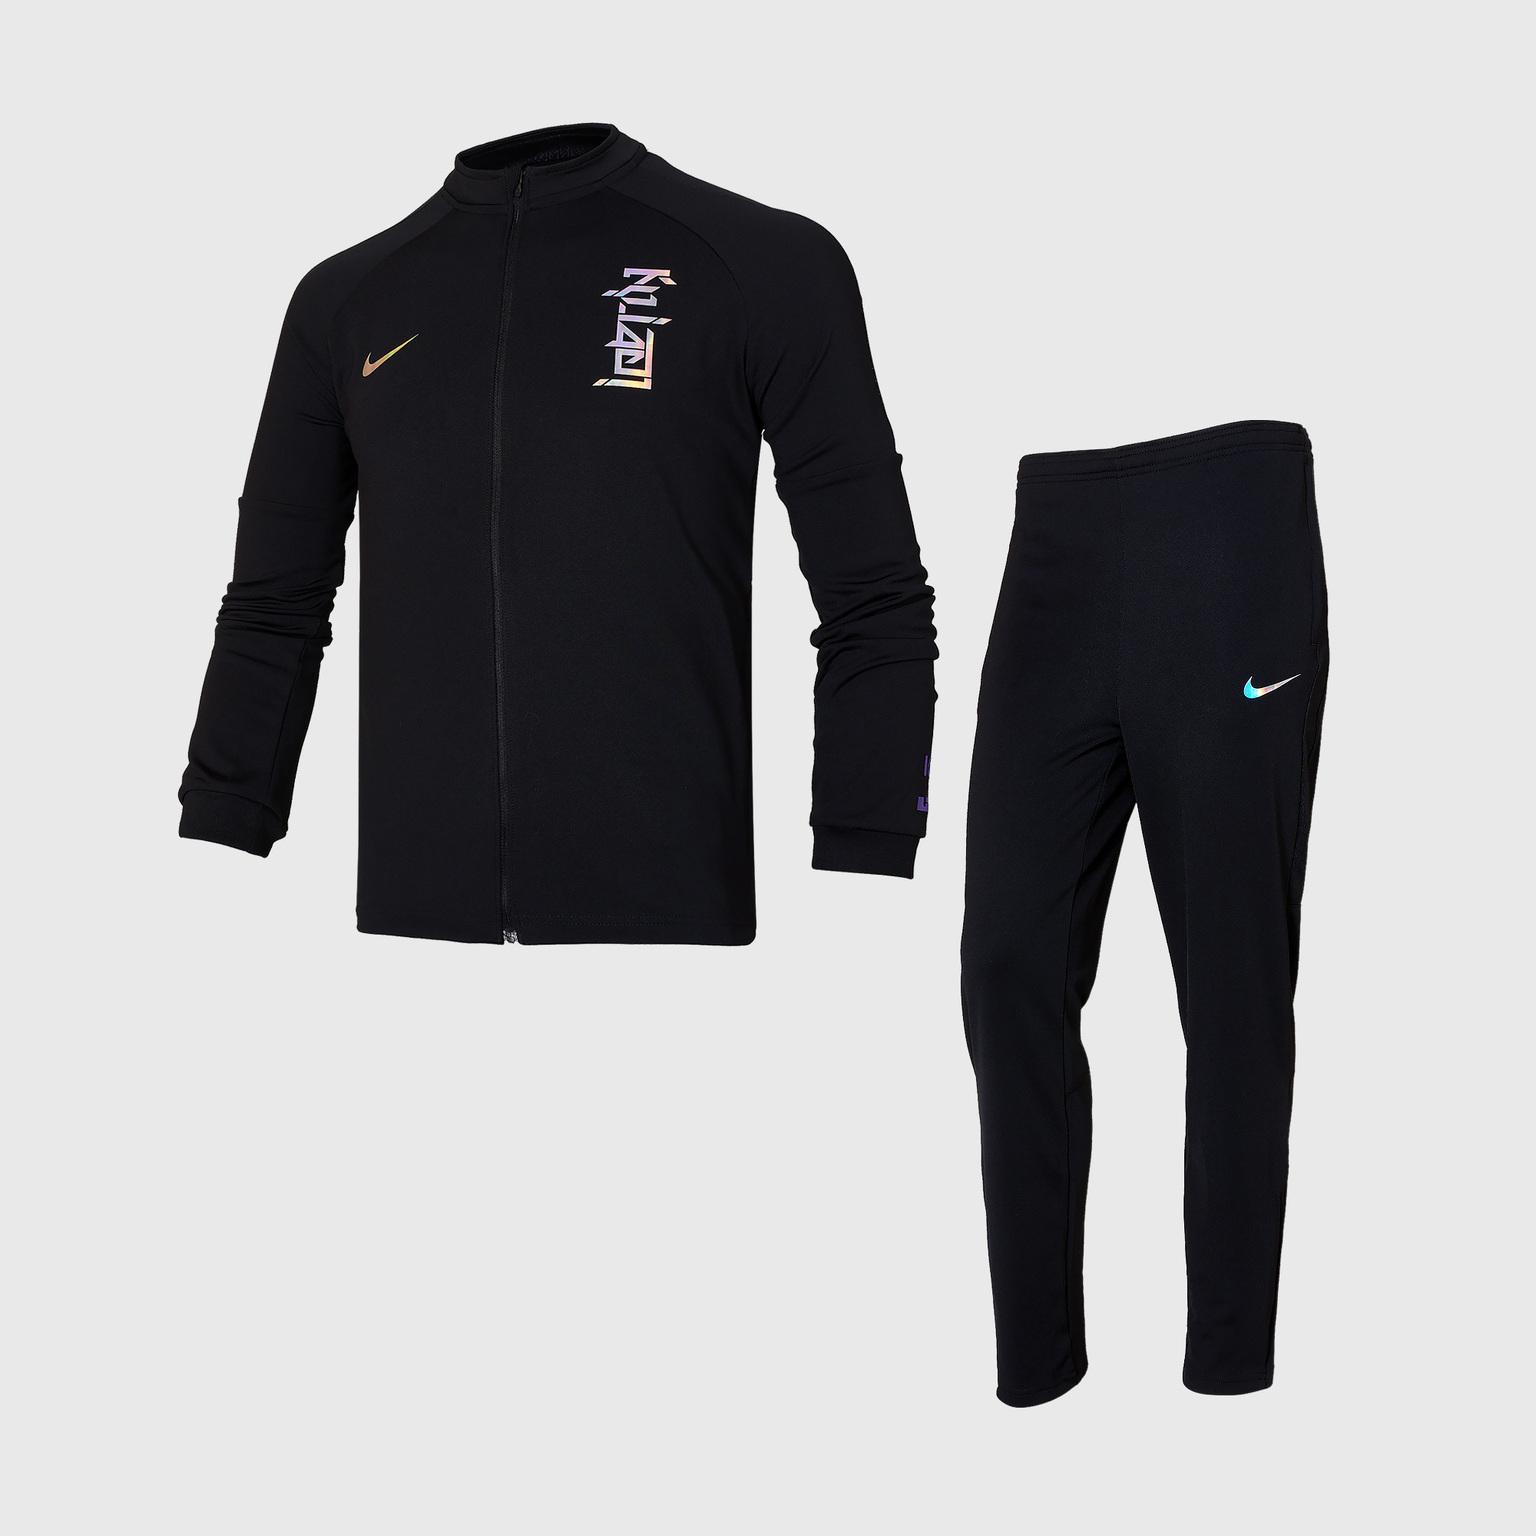 Костюм подростковый Nike Kylian Mbappe Dry Suit CV1500-010